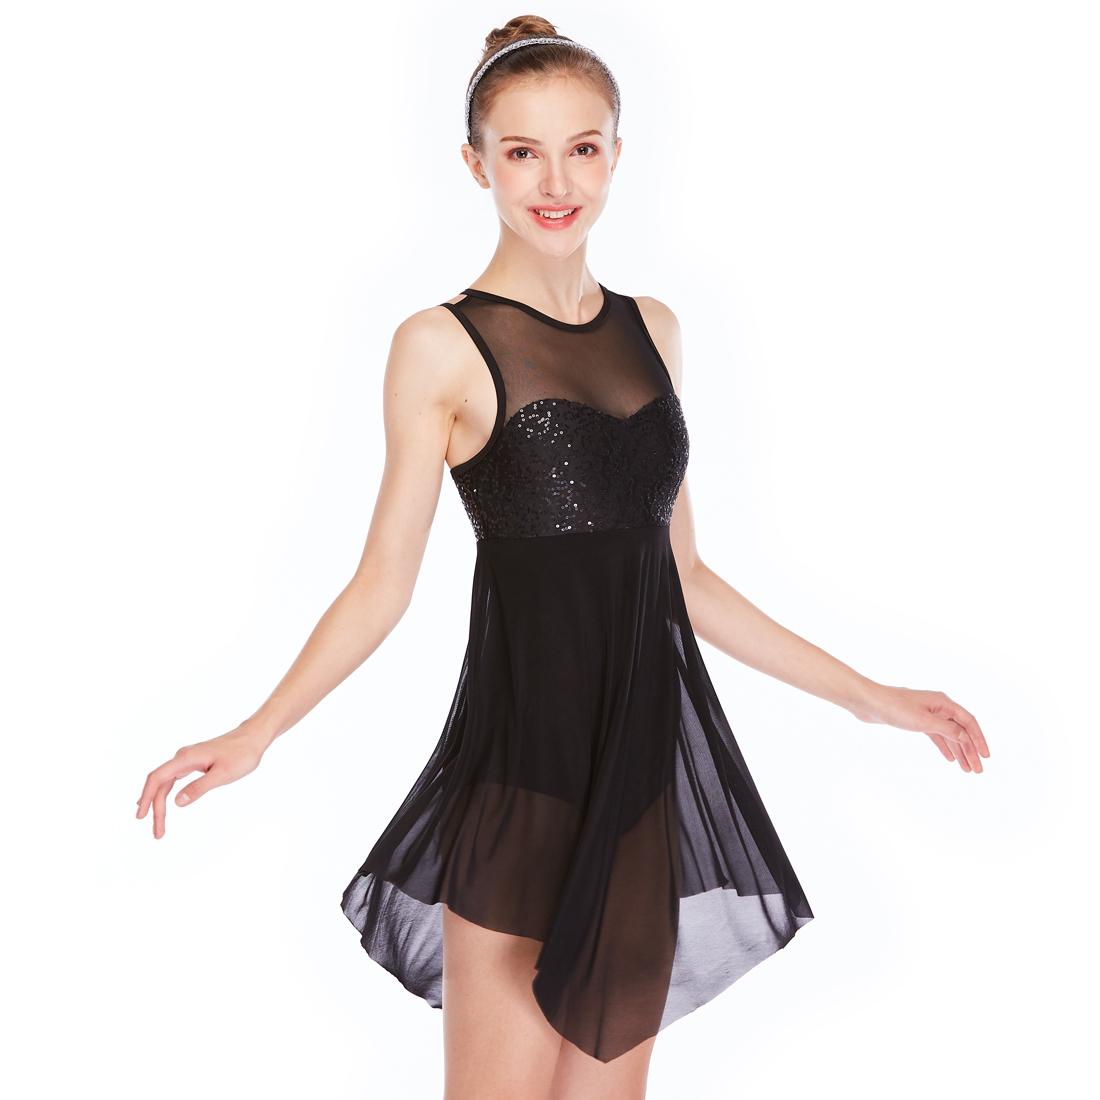 a19037acc Midee Dance Dress Lyrical Dance Costume Elegant Tank Illusion ...